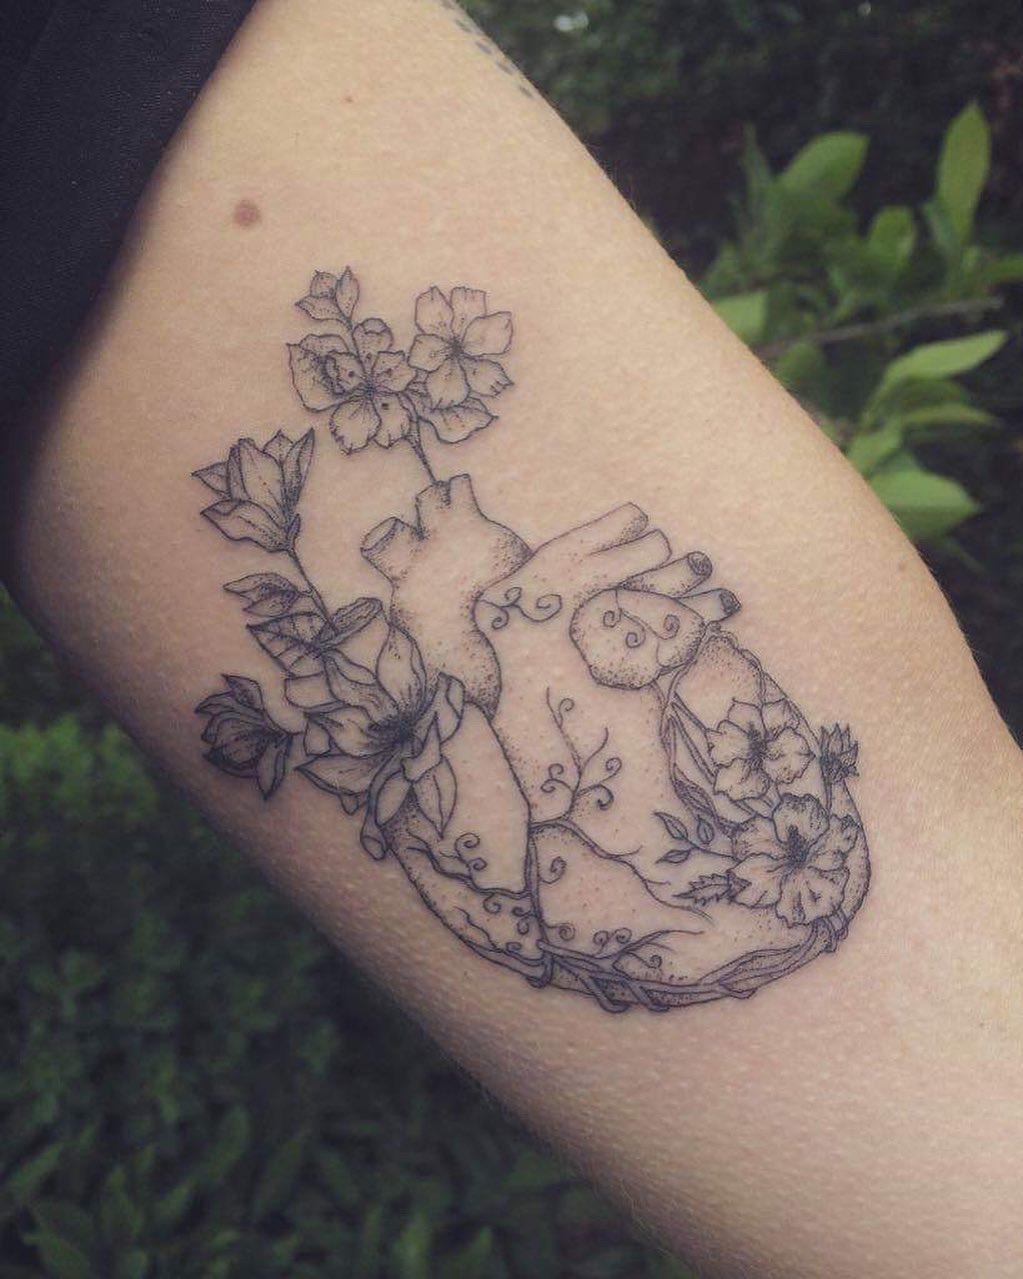 Animales & Nature (Tattoo)